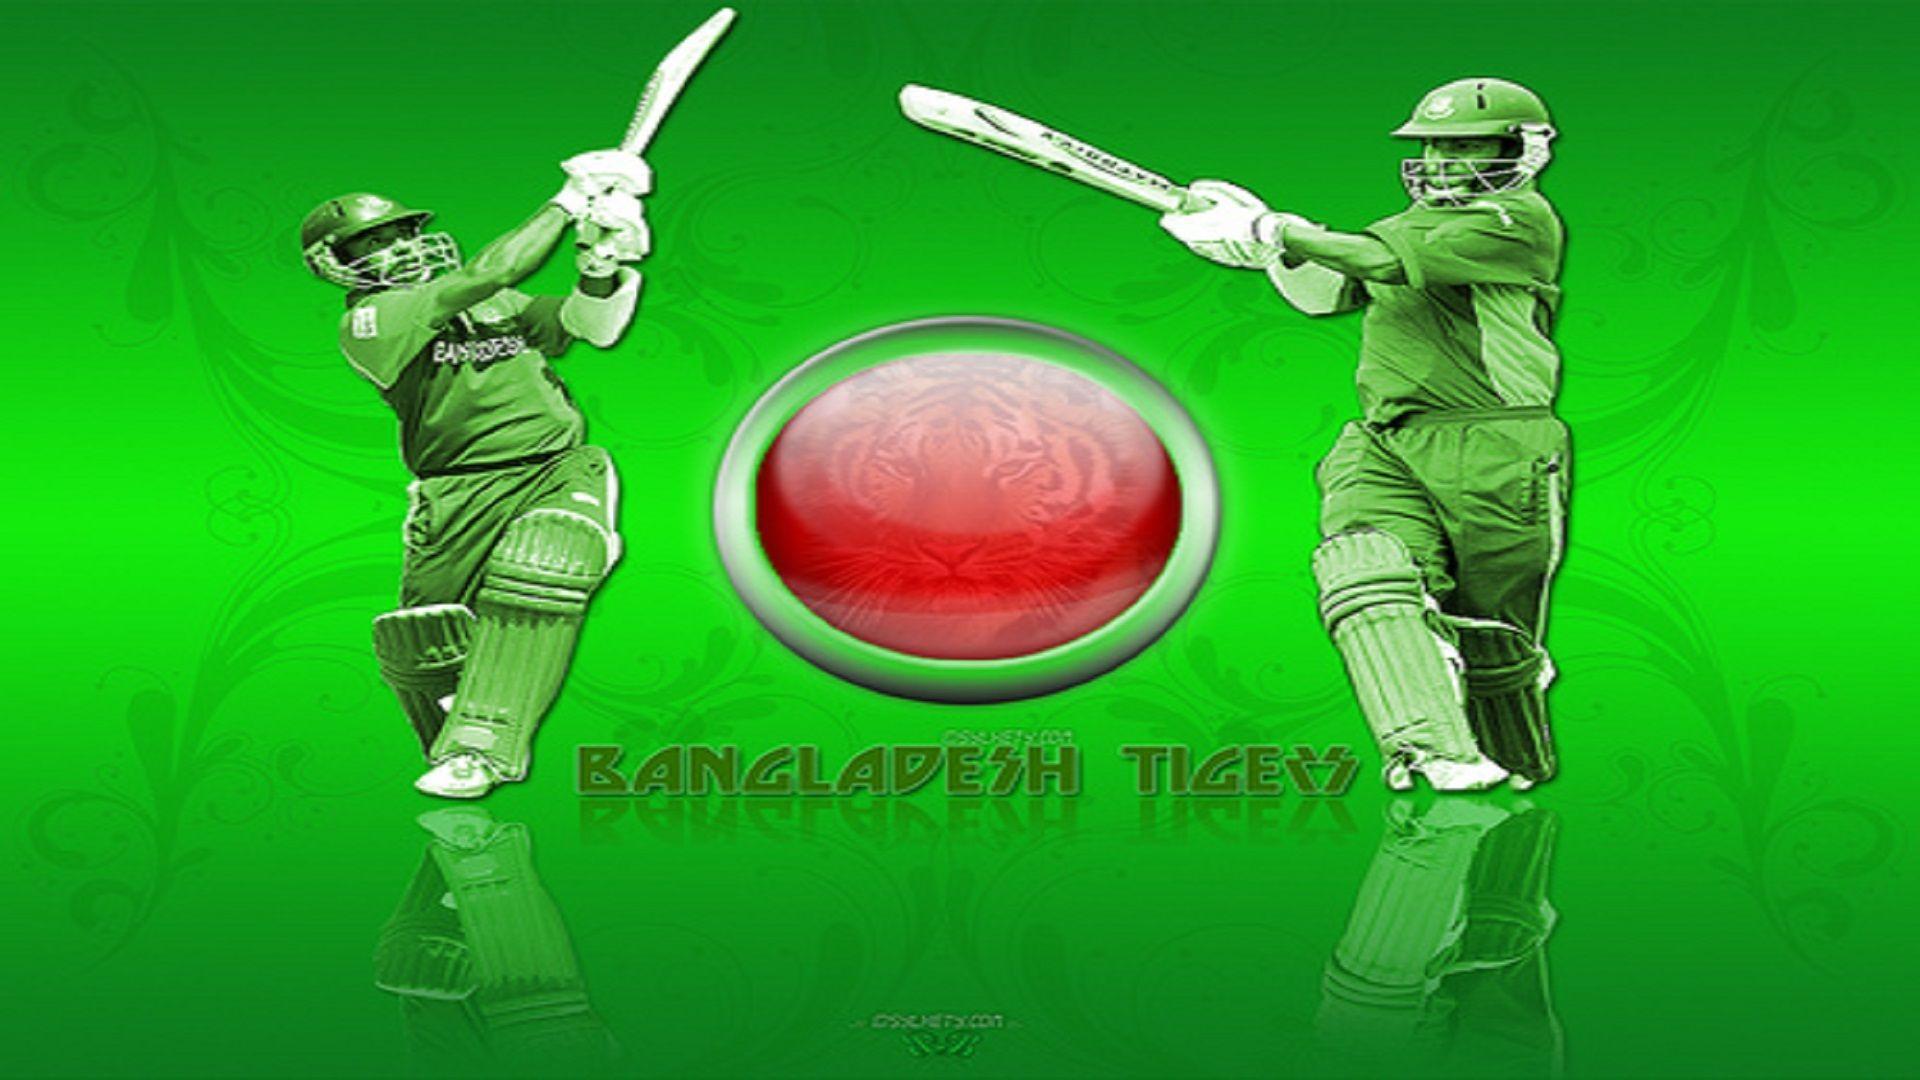 Cricket Wallpapers Hd Free Bat Ball Bd Cricket Wallpaper Hd 601831 Hd Wallpaper Backgrounds Download